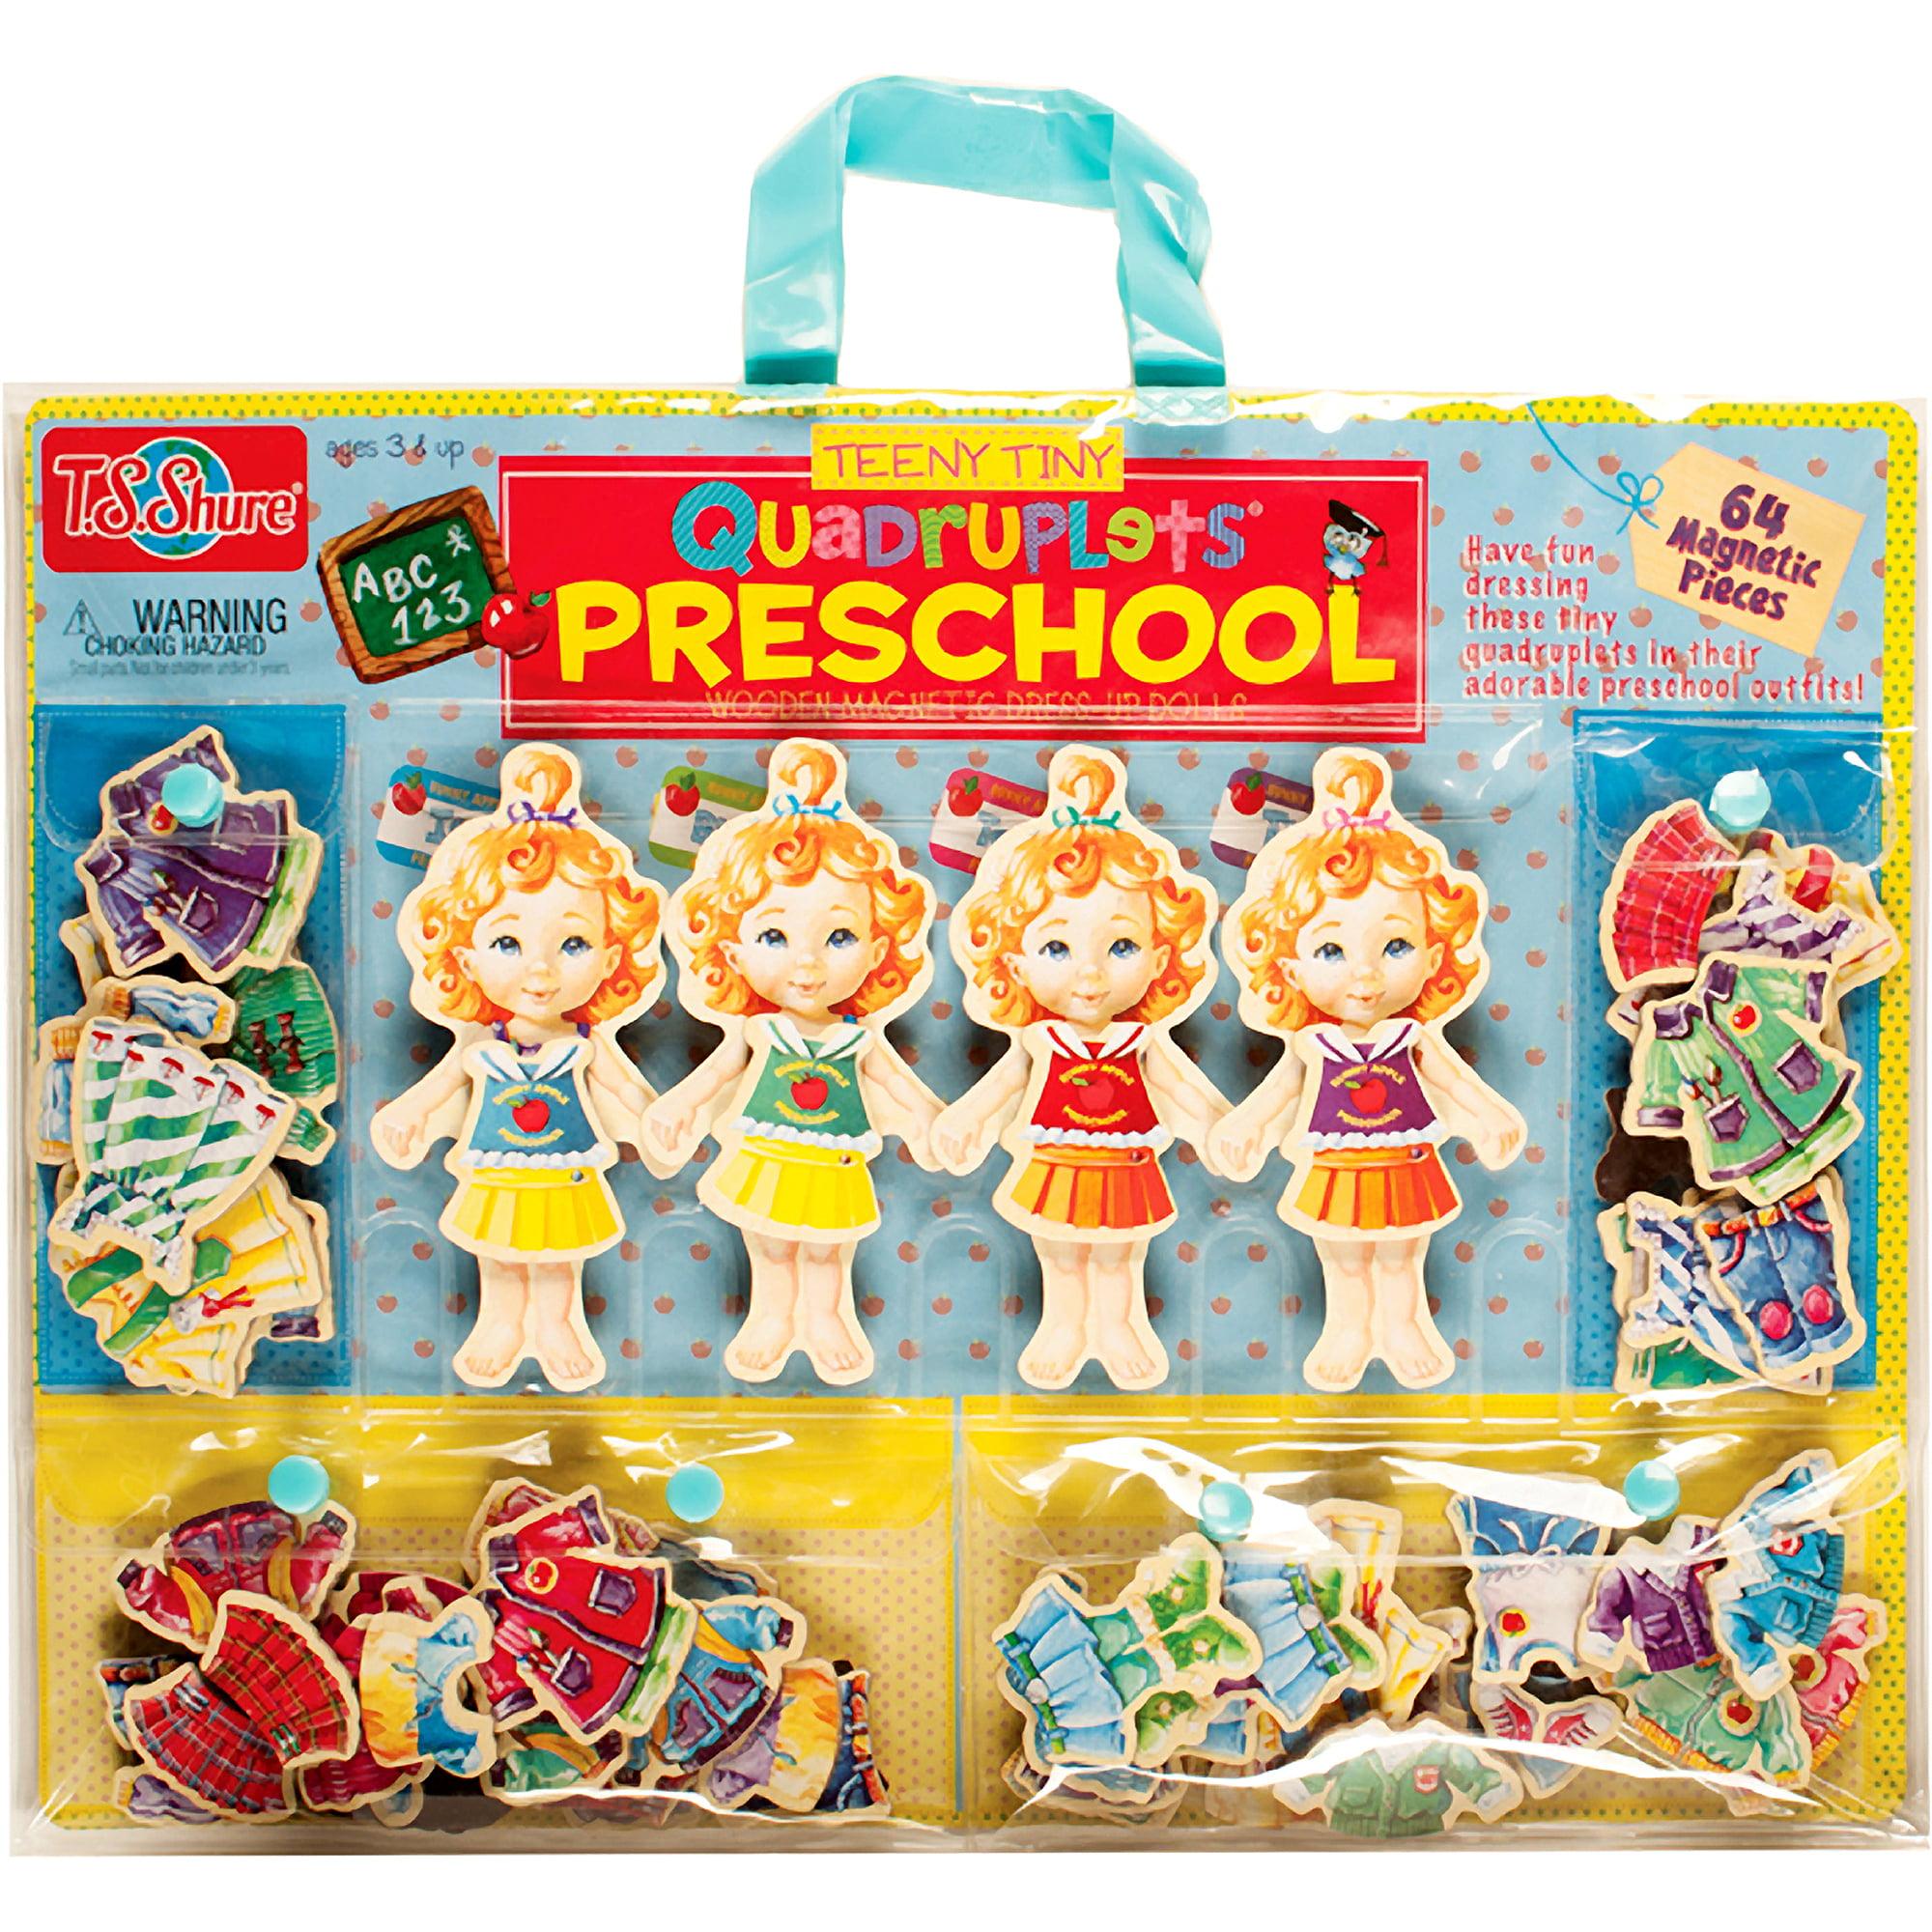 T.S. Shure Teeny Tiny Quadruplets Preschool Wooden Magnetic Dress-Up Dolls by TS Shure